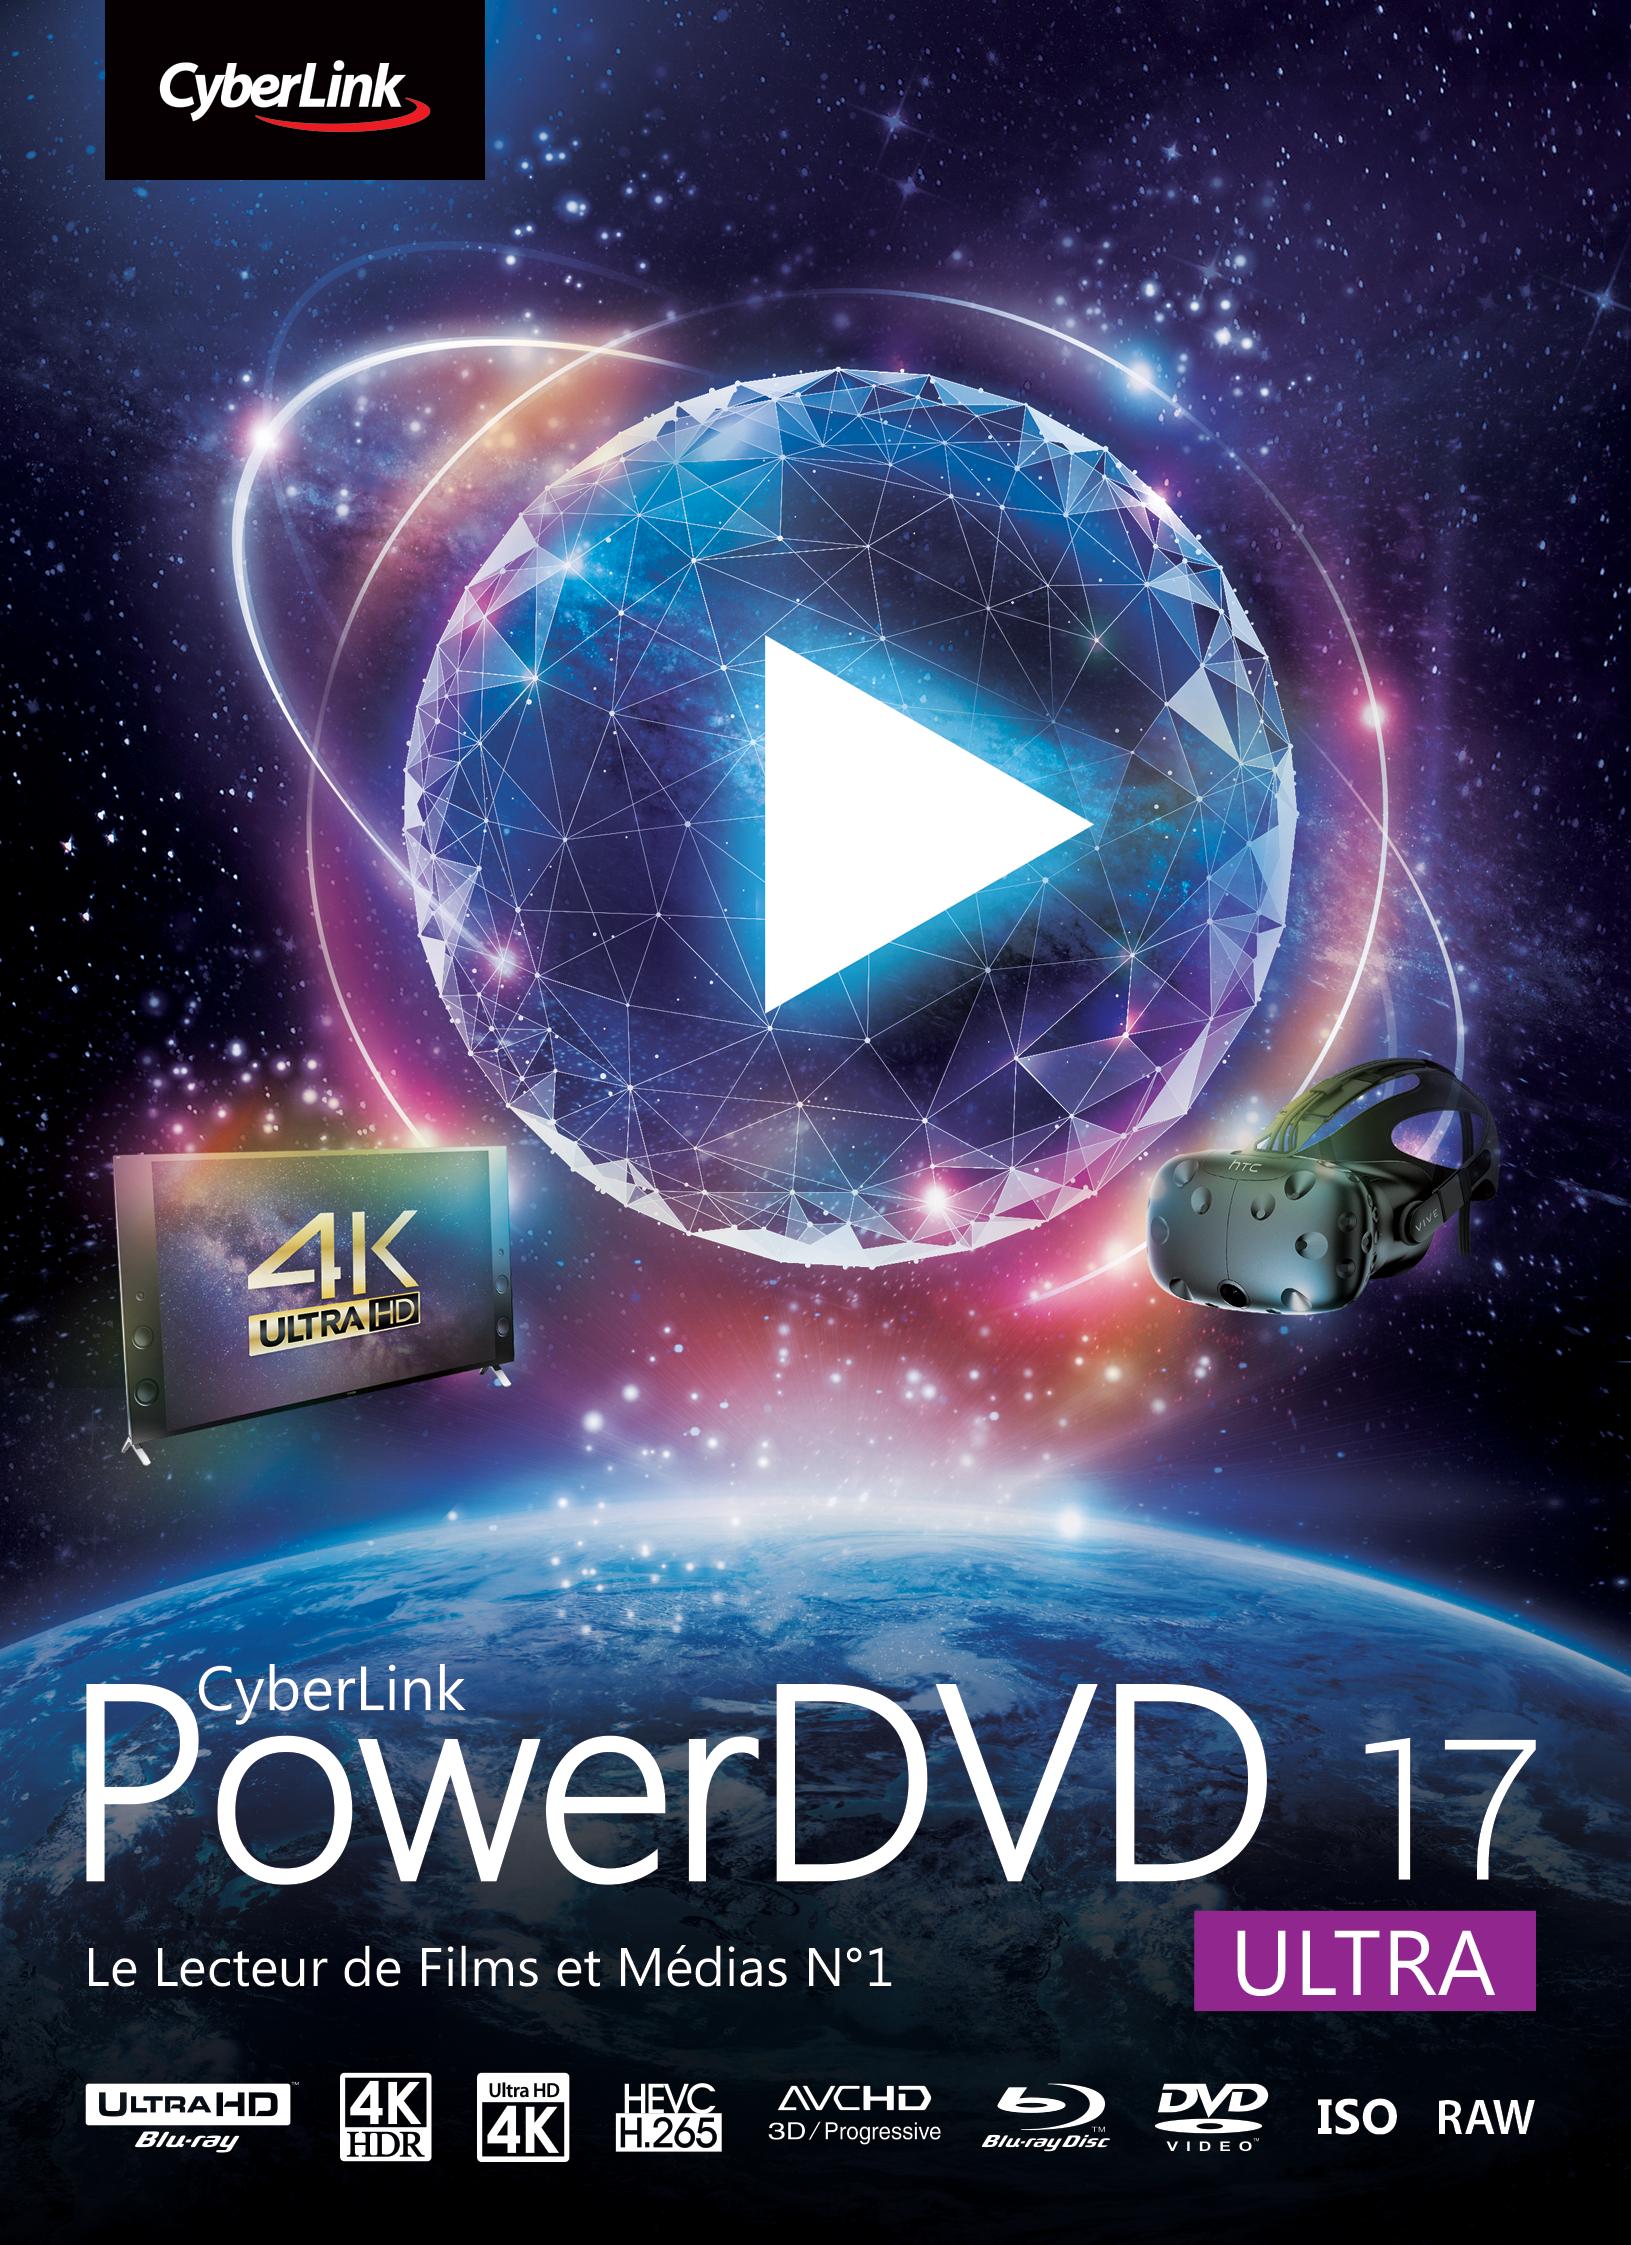 powerdvd-17-ultra-telechargement